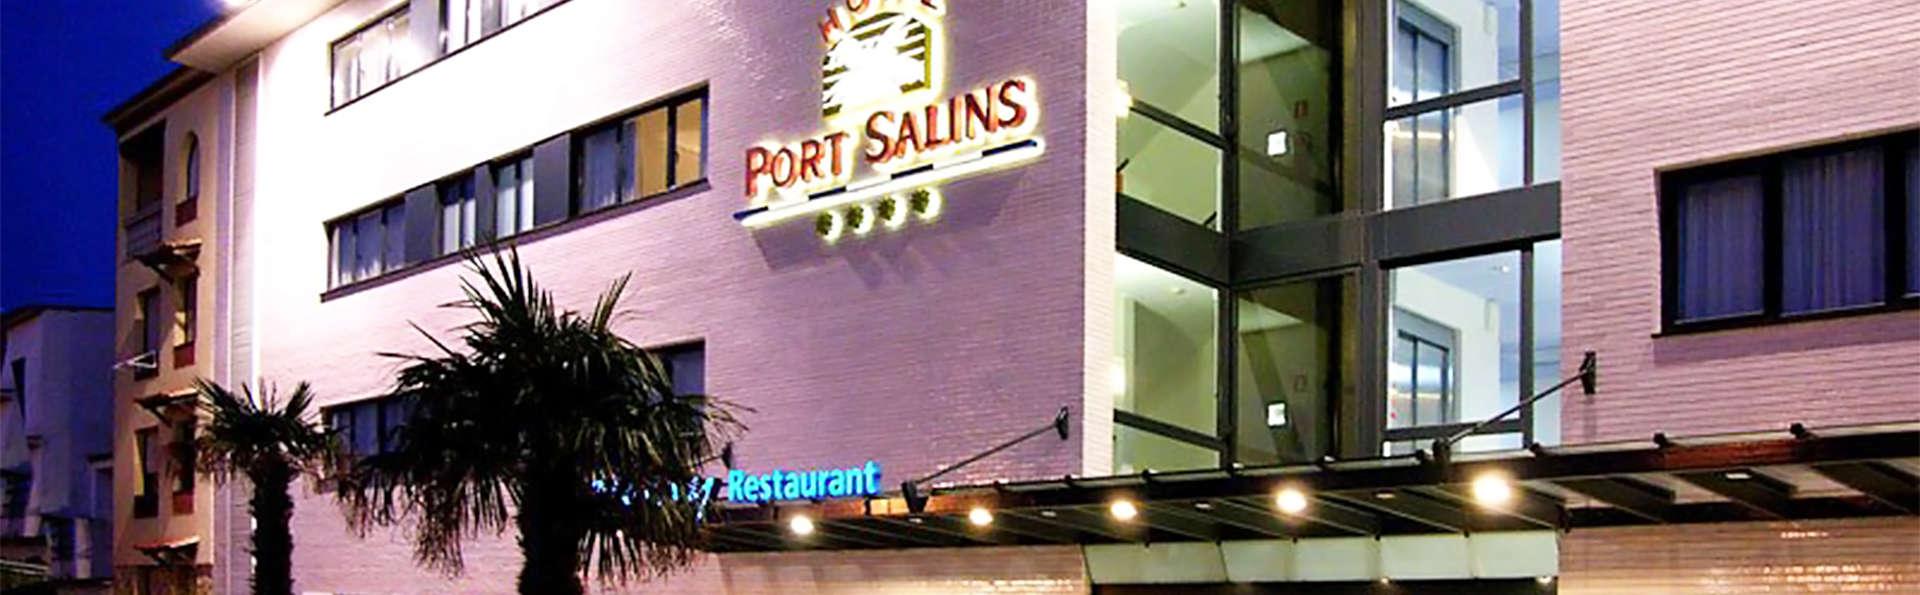 Hotel Port Salins - EDIT_front1.jpg